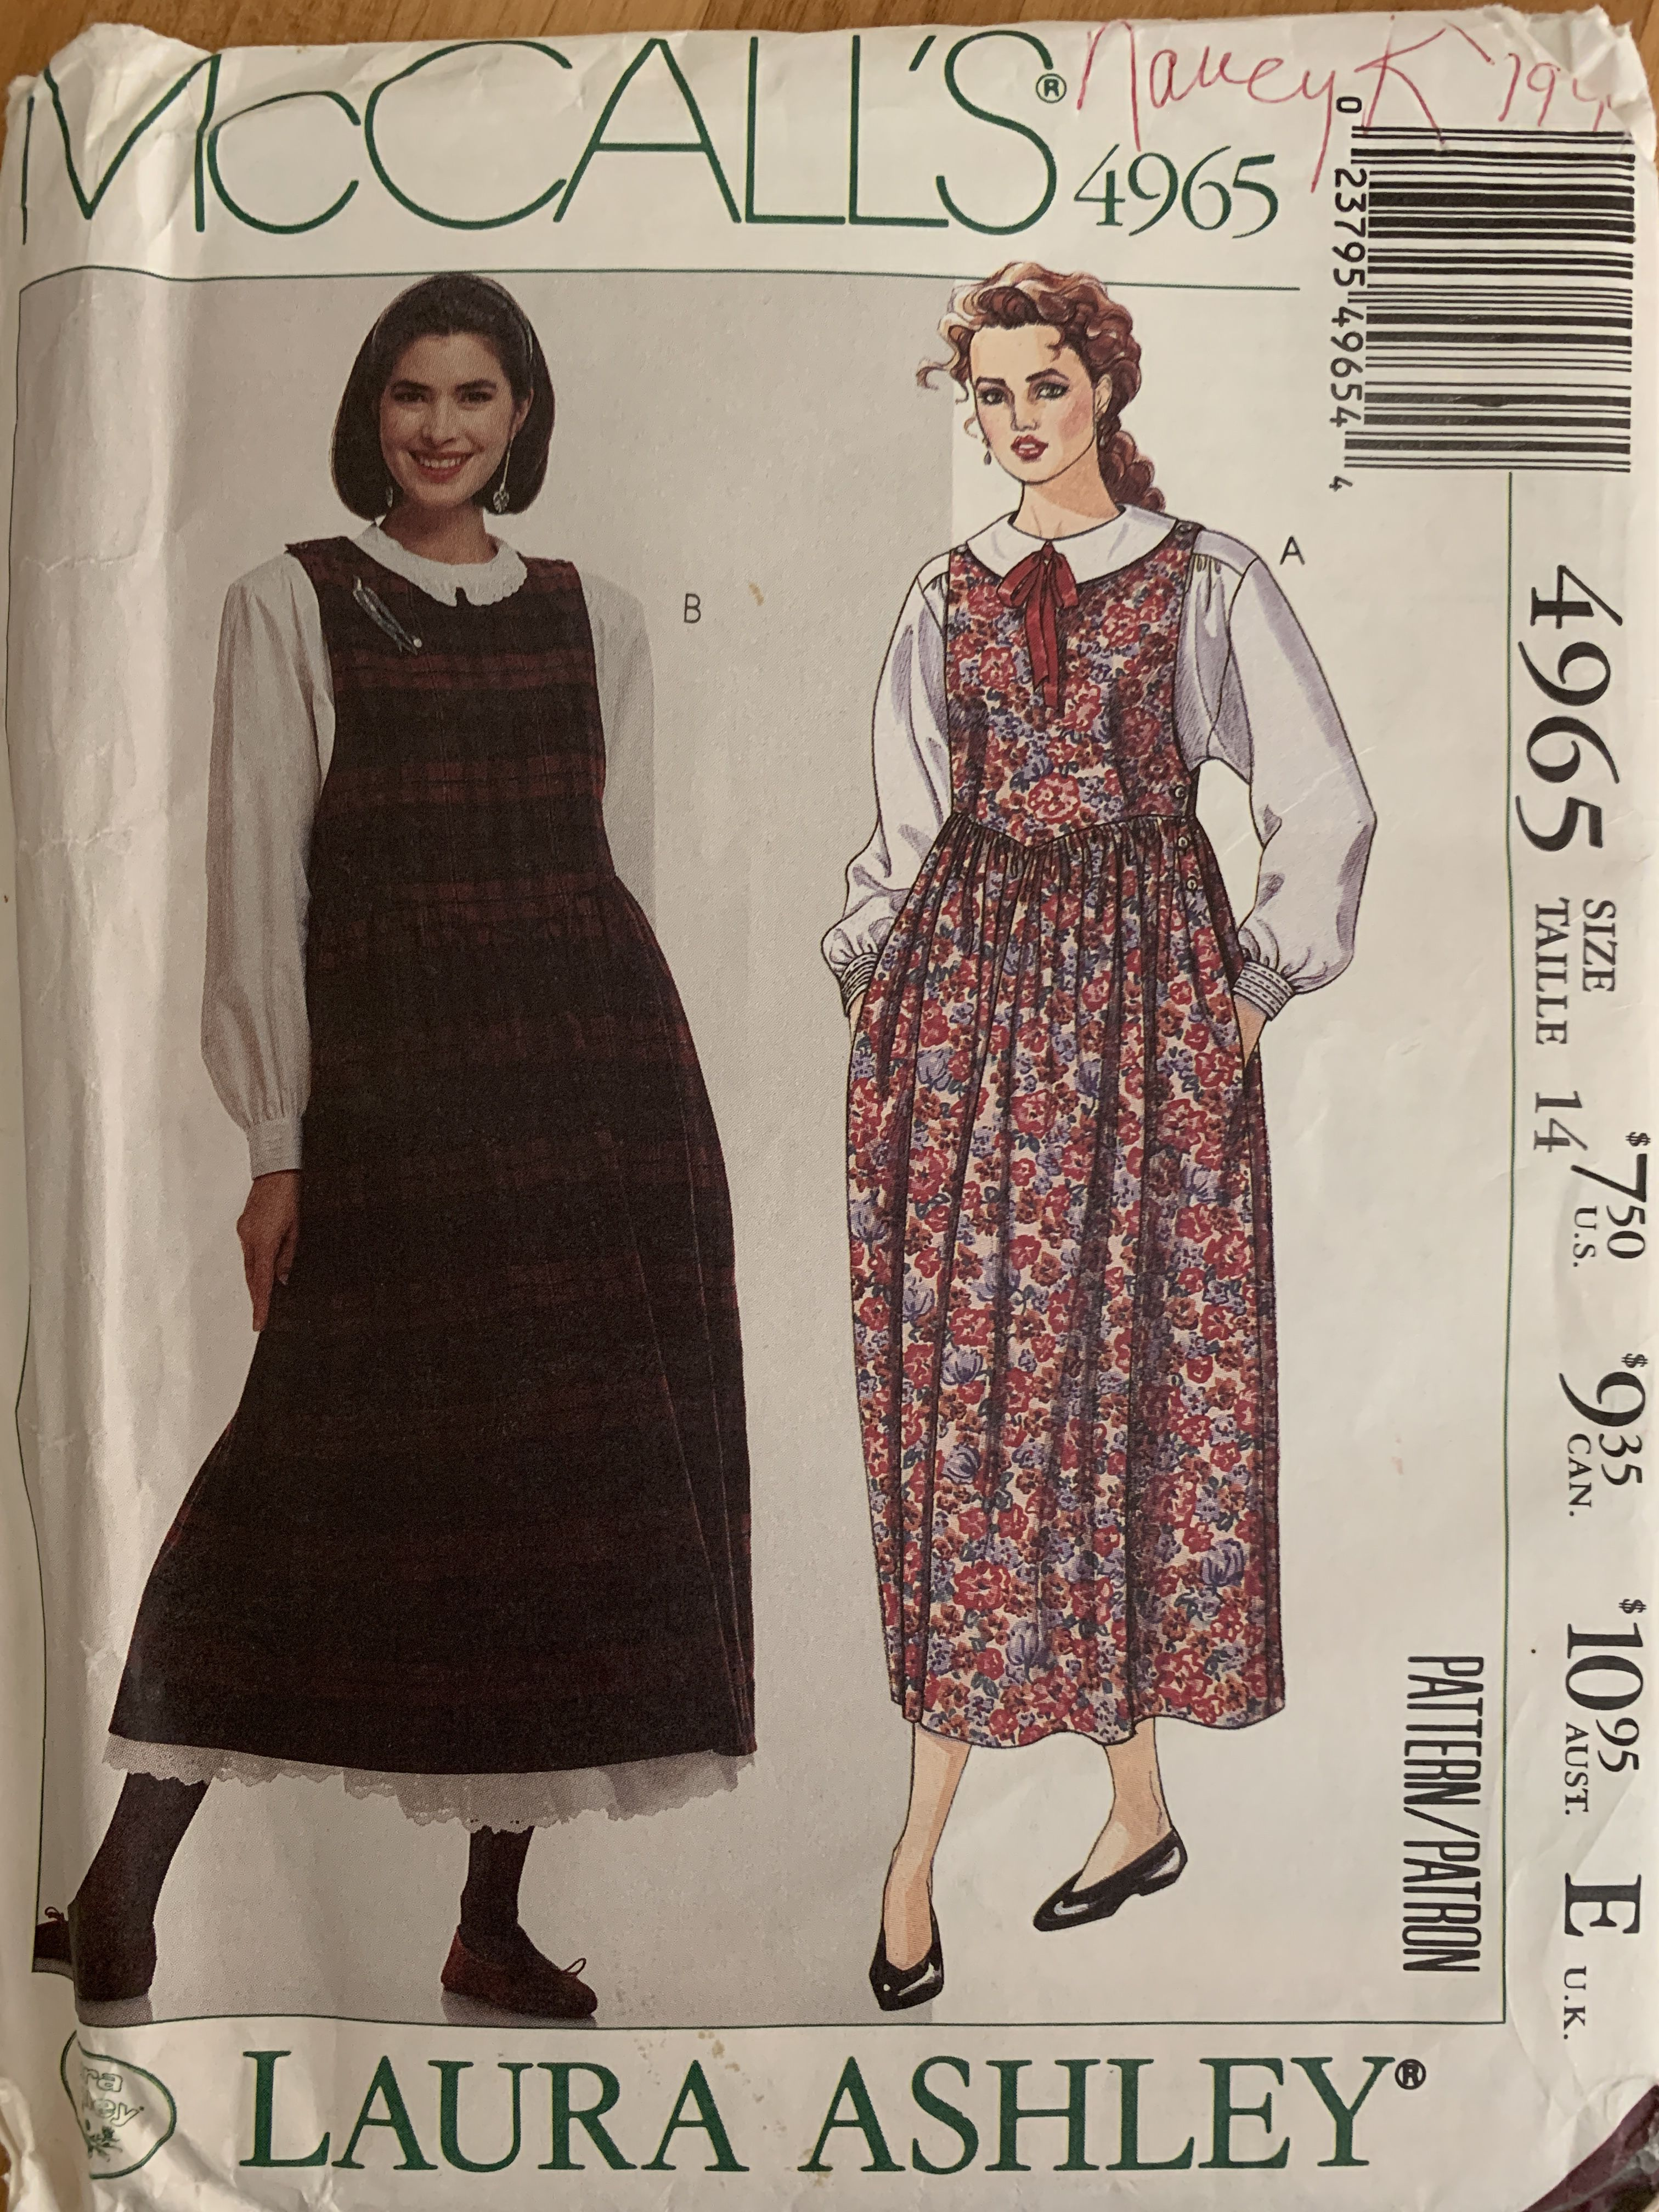 1989 Mccall S 4965 Fashion Petticoat Laura Ashley